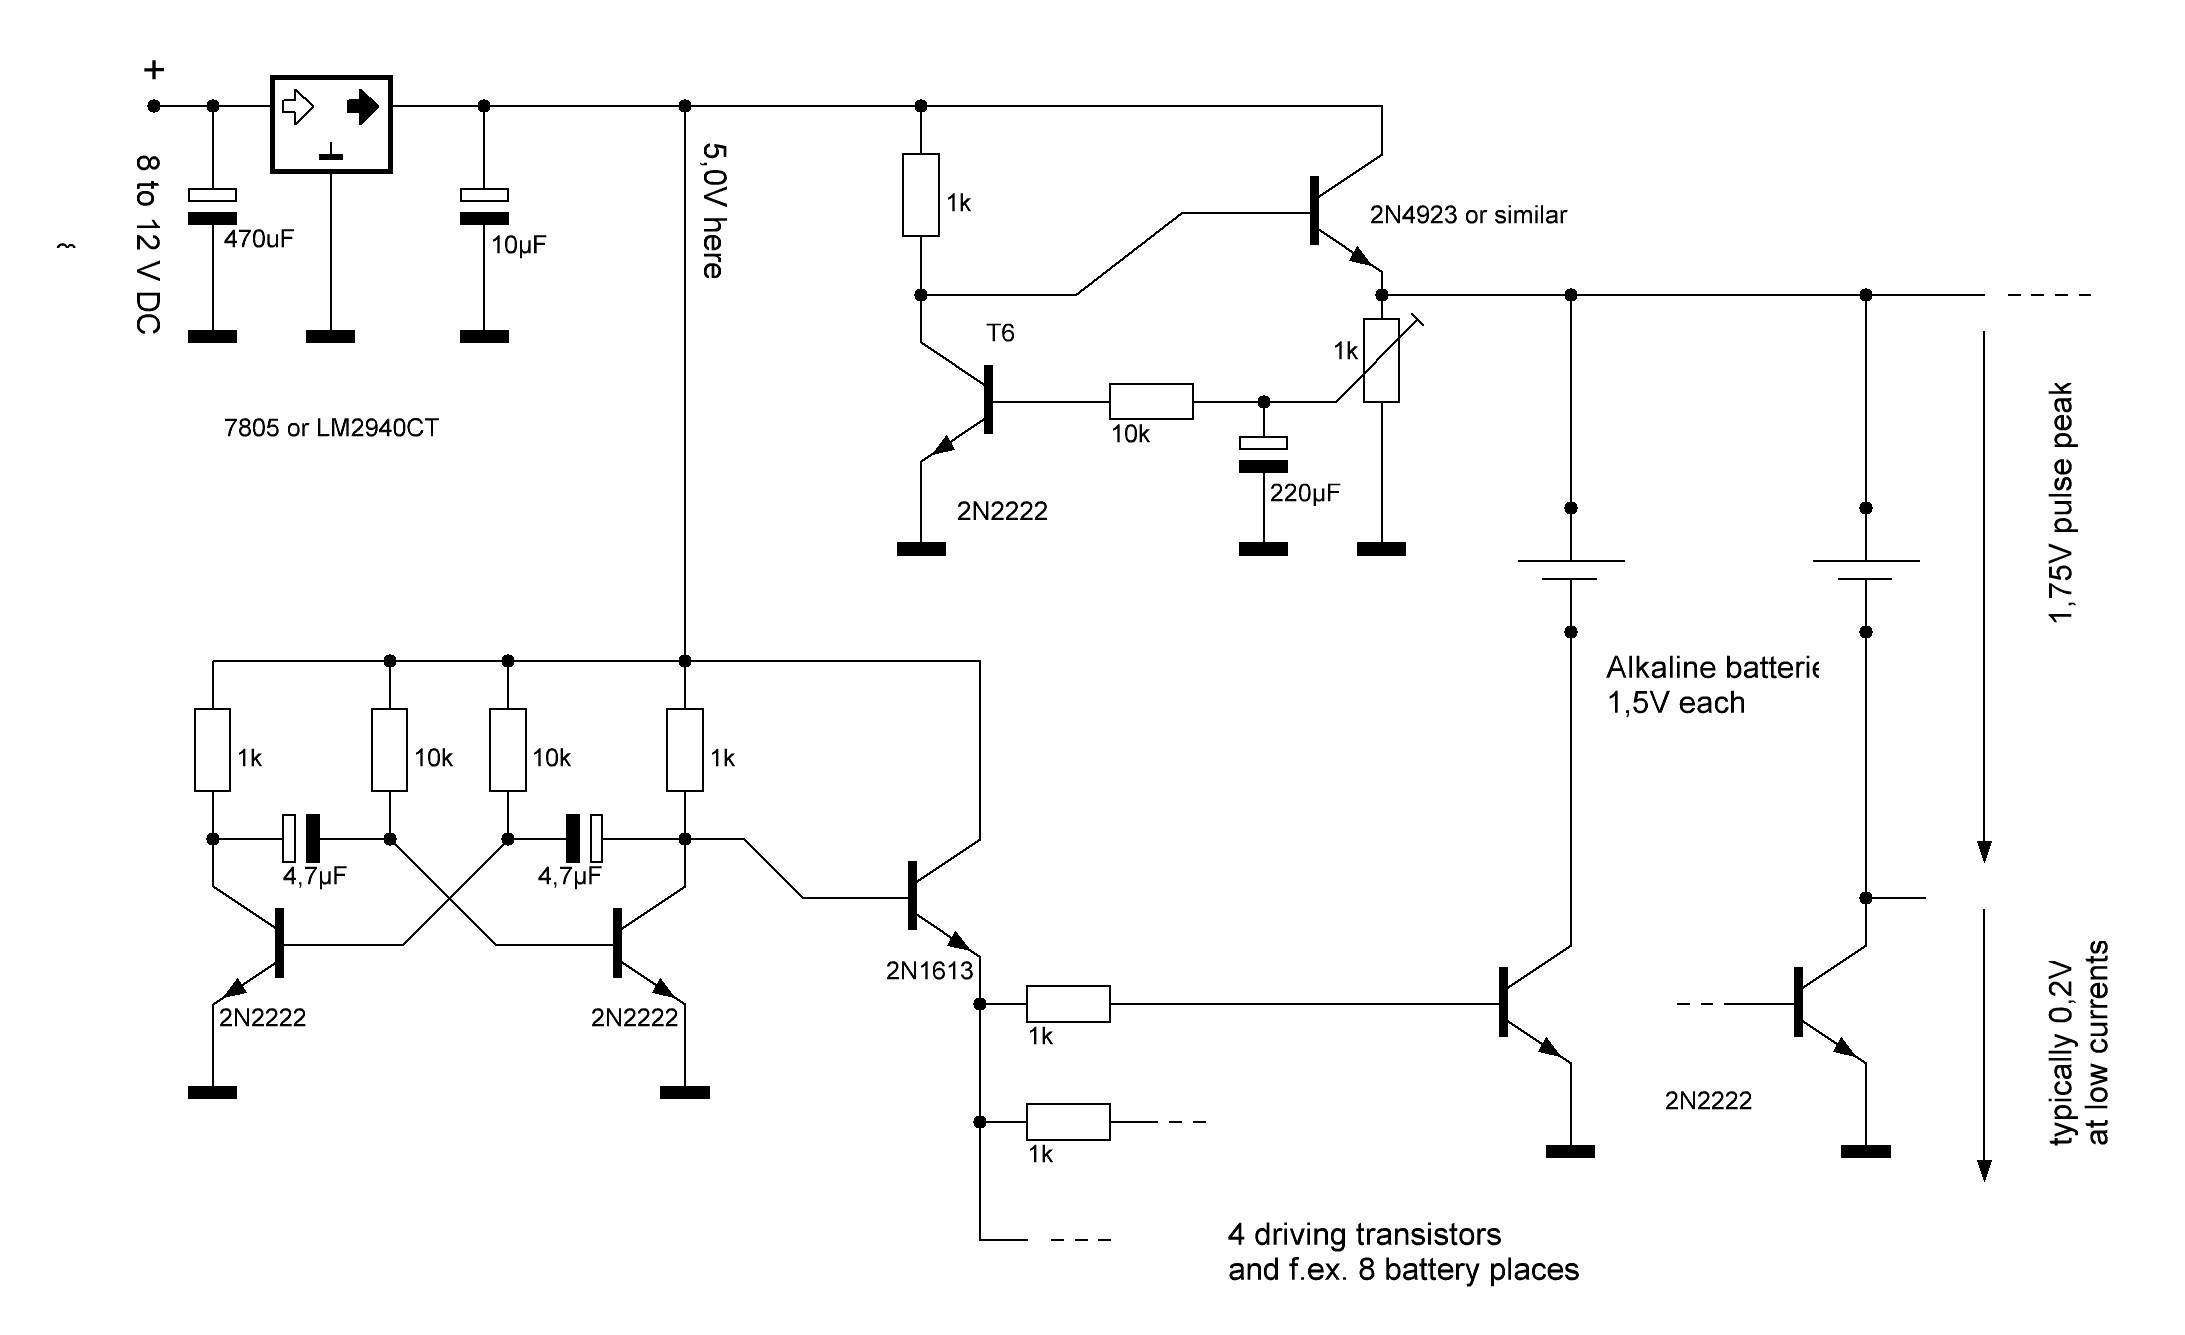 Car Charger Circuit Diagram Ponent Solar Battery Schematic 12v Usb Wiring Regenerate Alkaline Batteries Regenerator Of